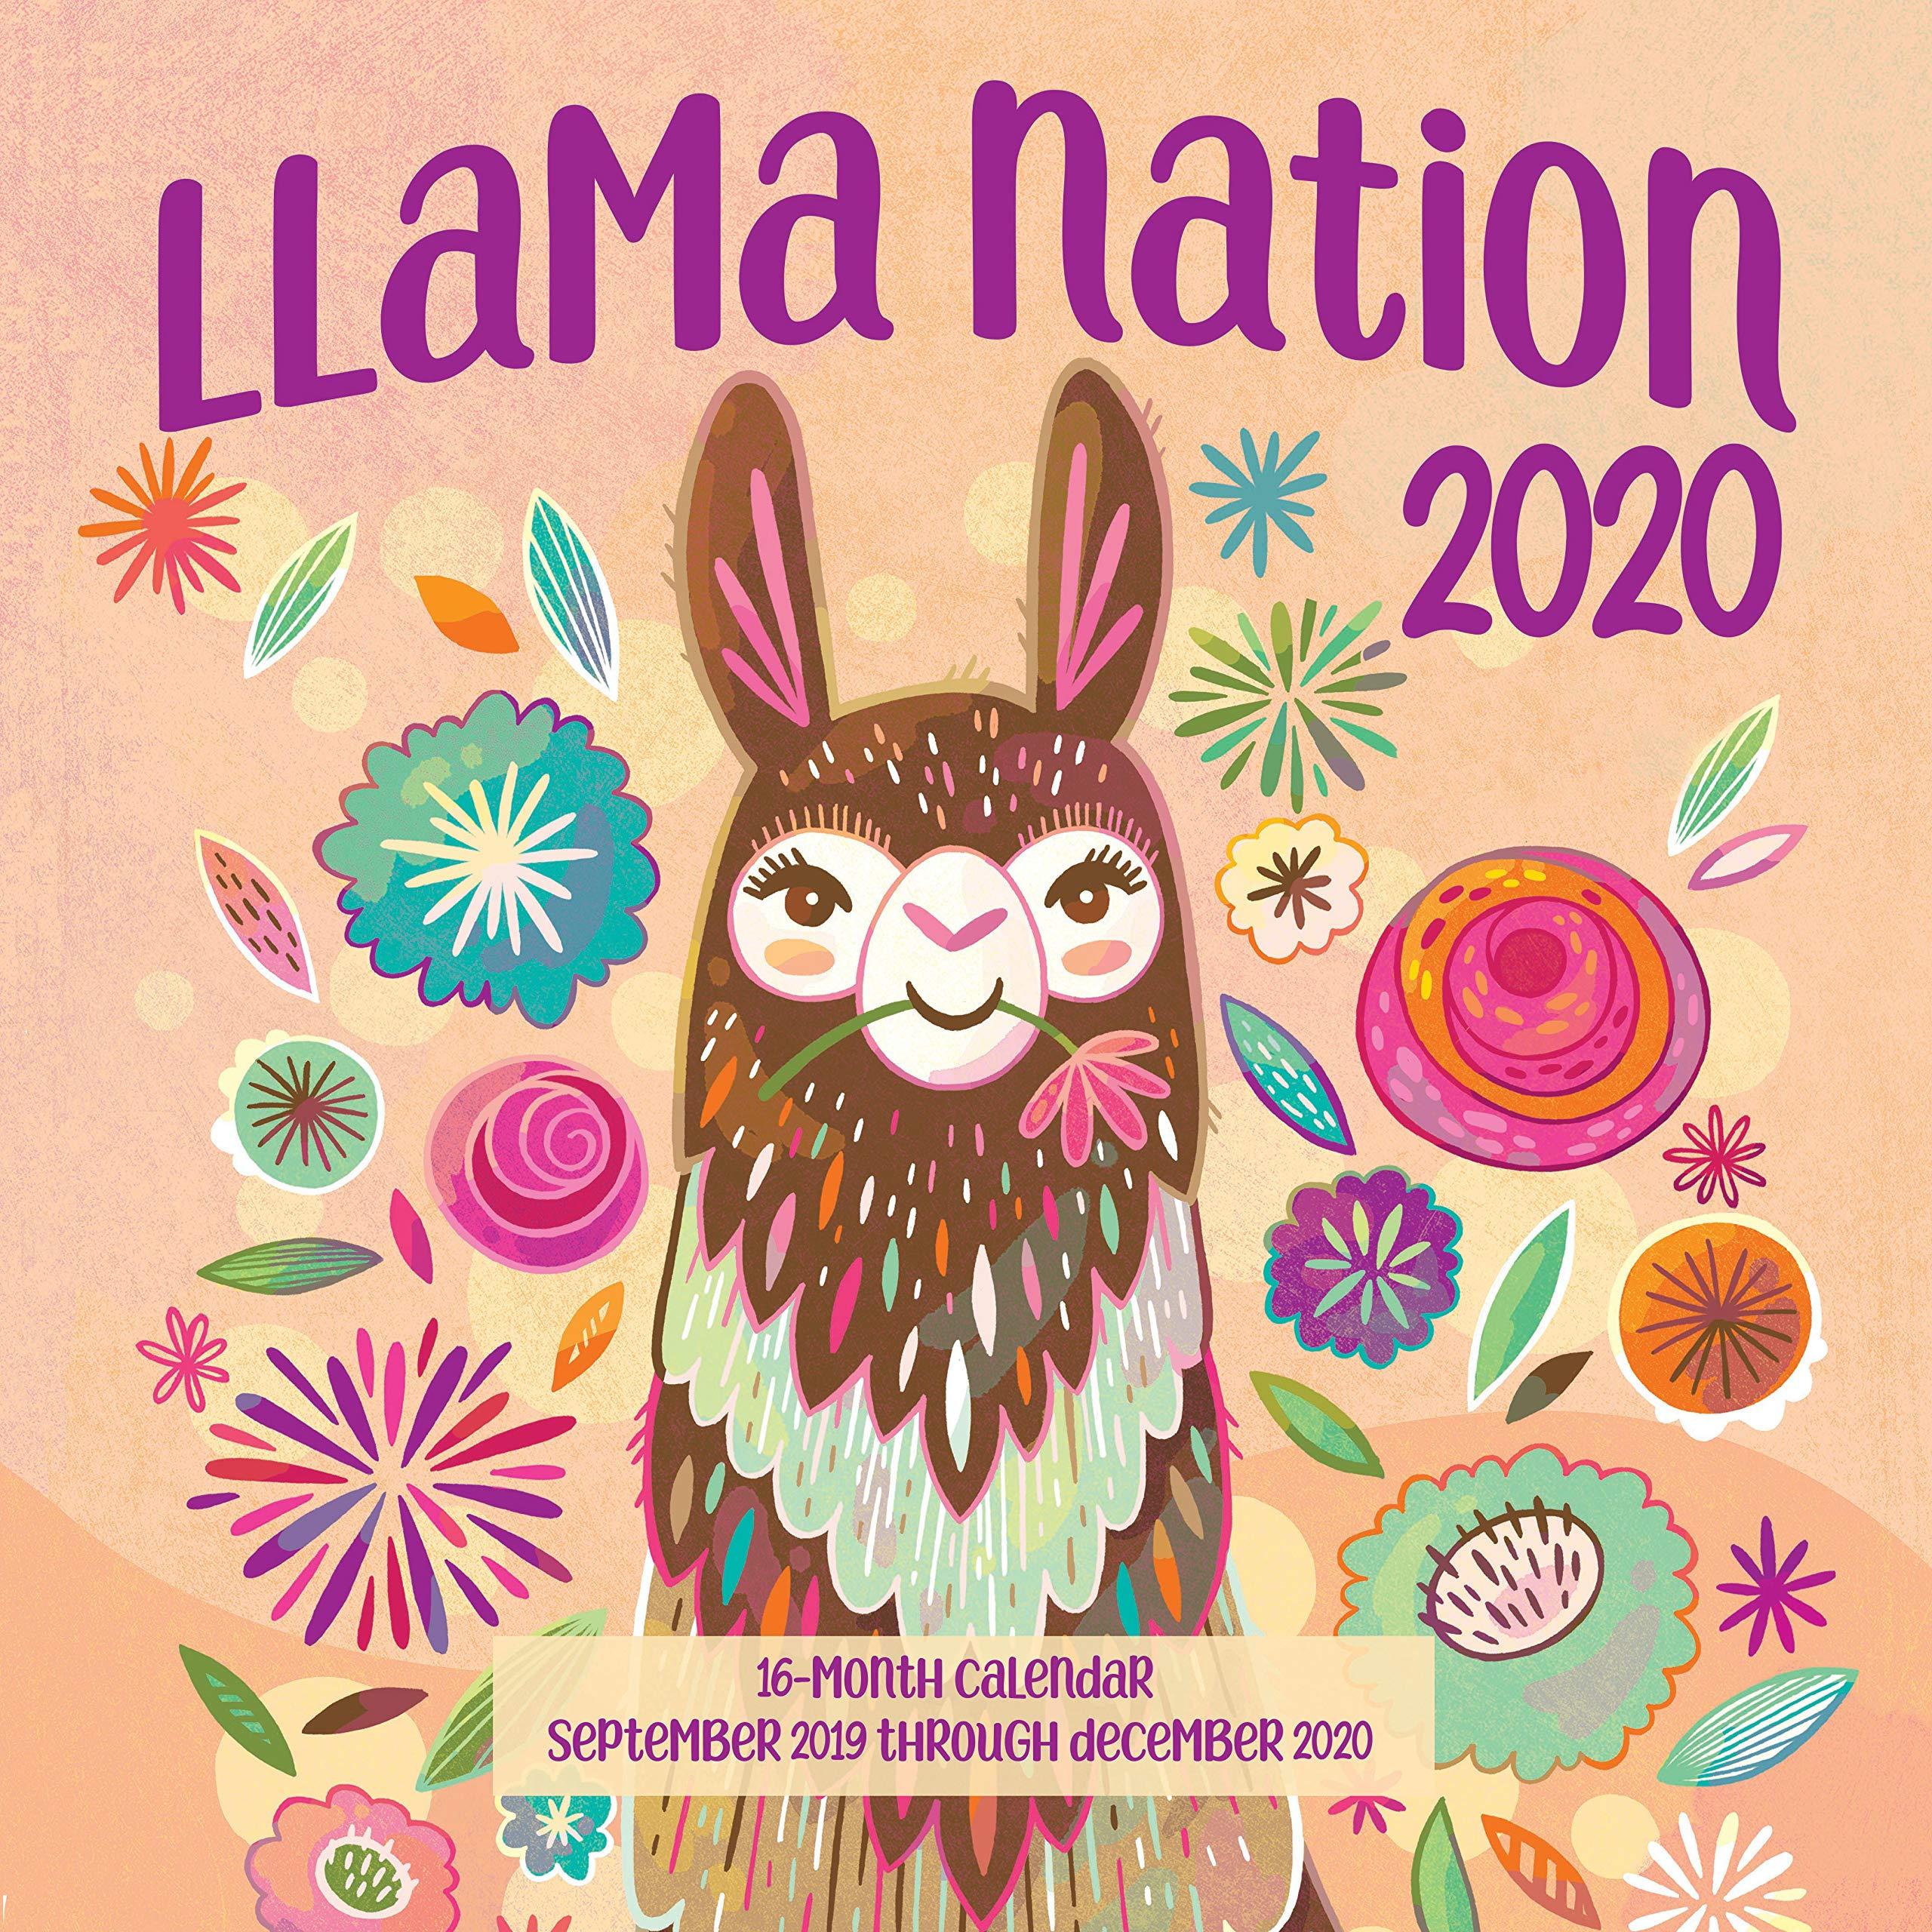 New York Movie Premiere December 2020 Calendar Llama Nation 2020: 16 Month Calendar September 2019 Through